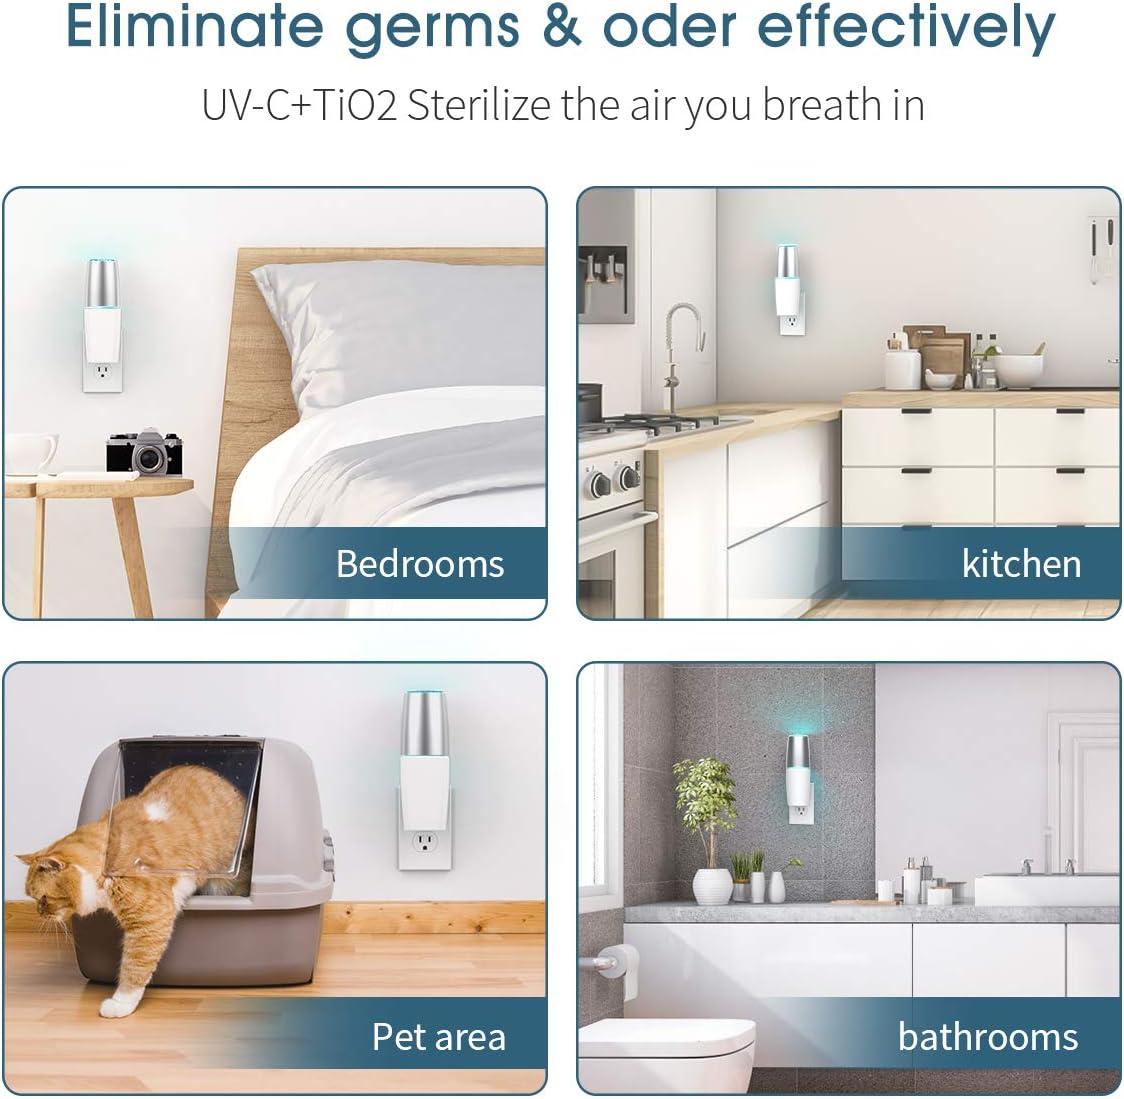 Portable UV Light Sanitizer, Eliminates Germs & Odor with UV-C Light Kill Airborne Viruses for Bedrooms, Kitchen, Bathroom, Pet Area, Nursery: Kitchen & Dining